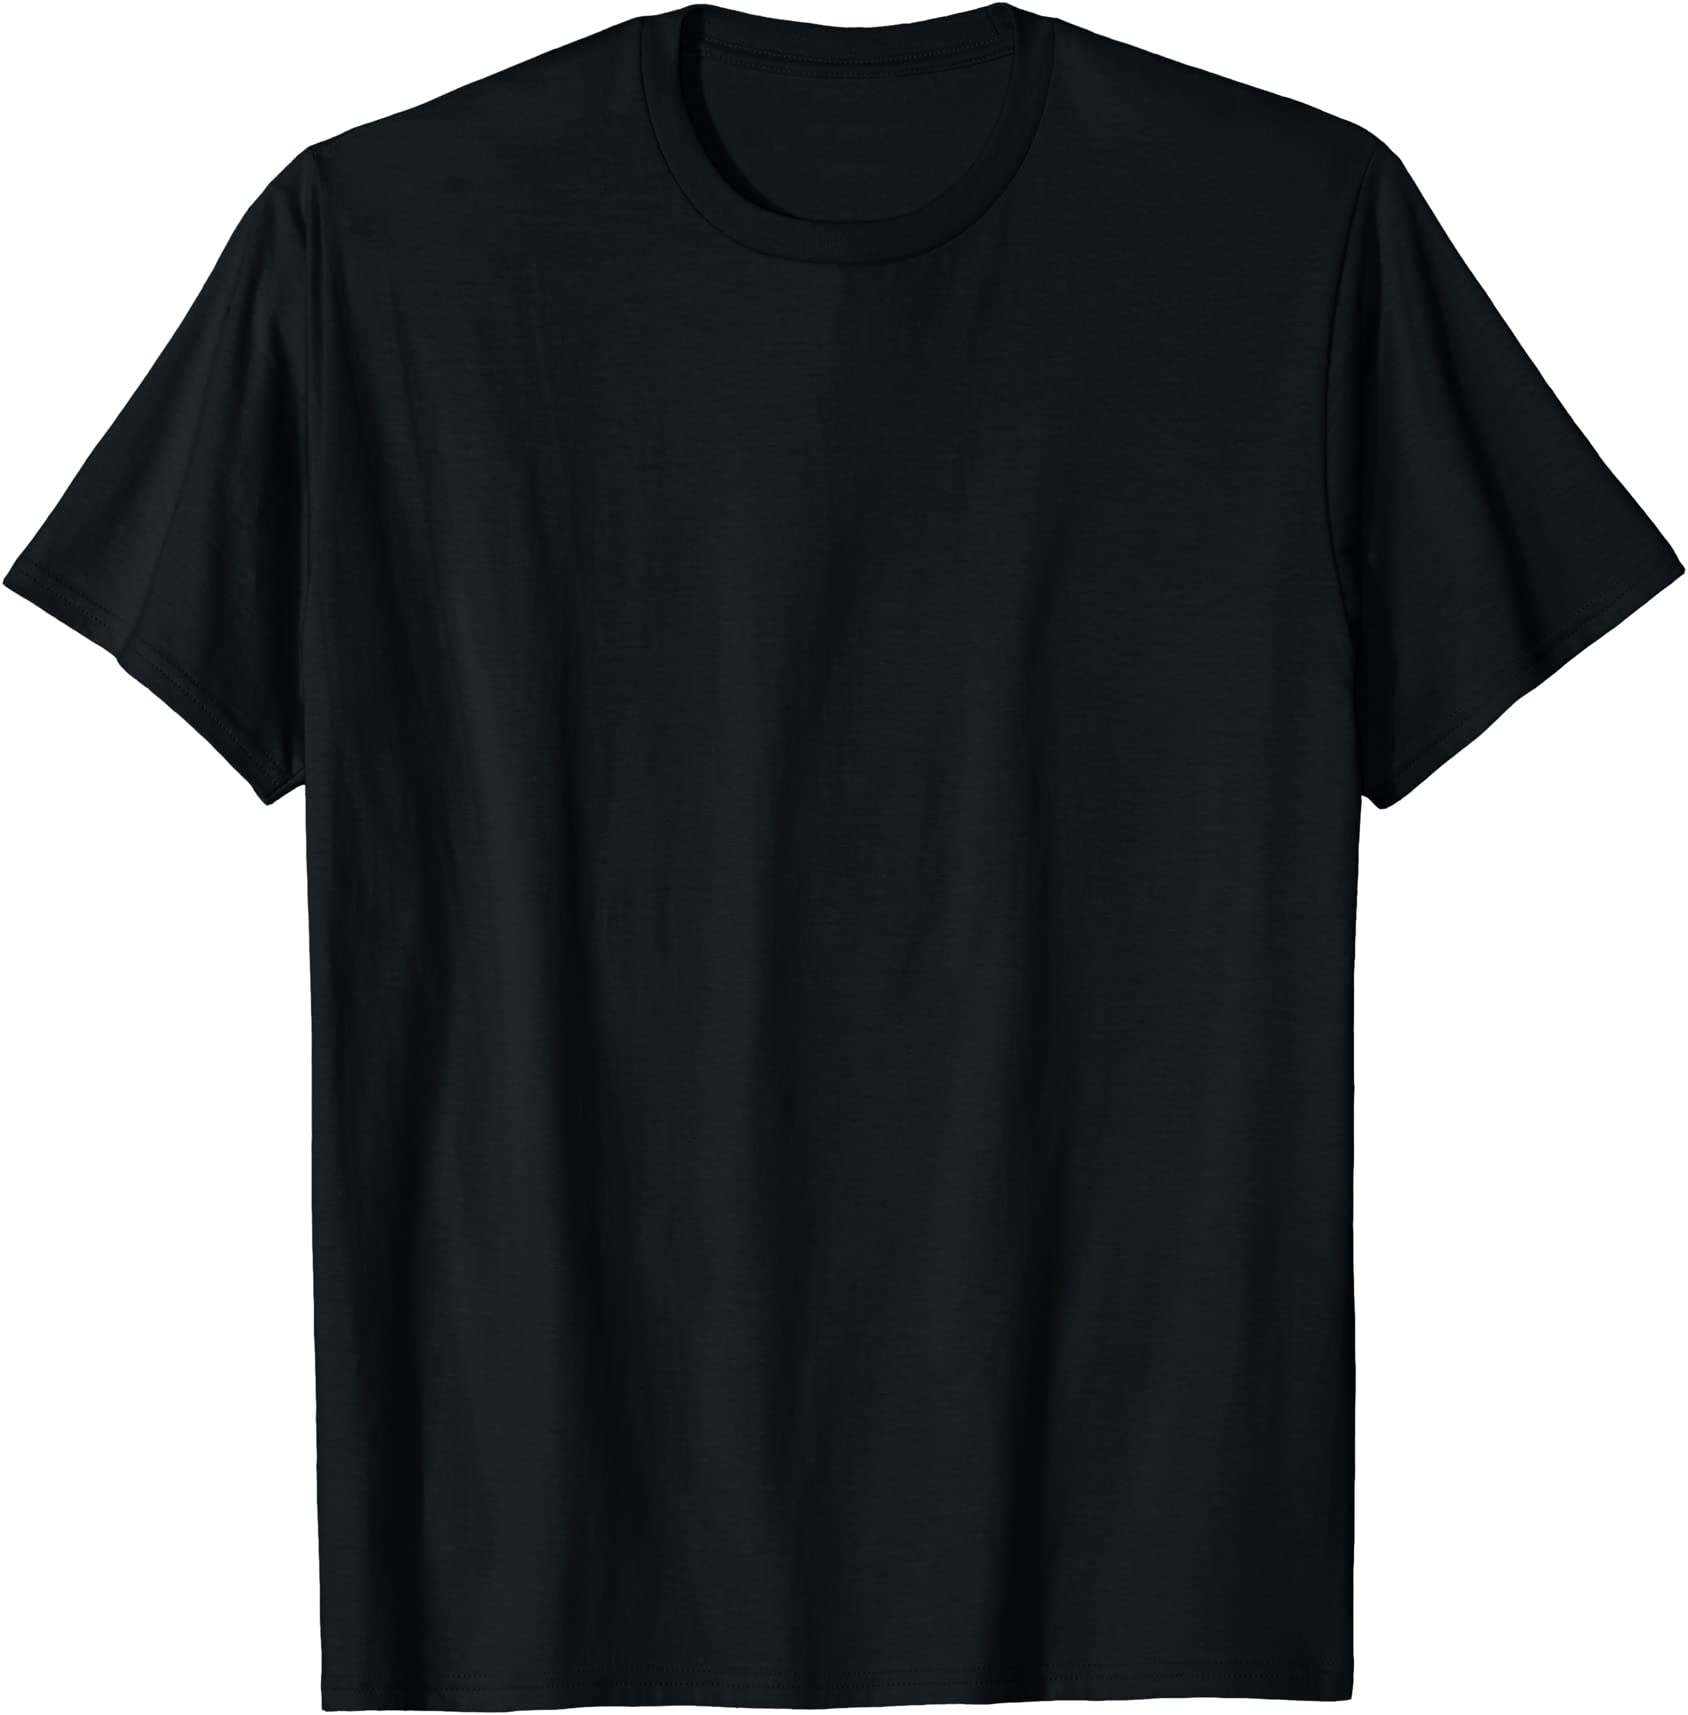 Arsmt Id Rather Be Flying Infan Short Sleeve T-Shirt Boy Birthday Gift